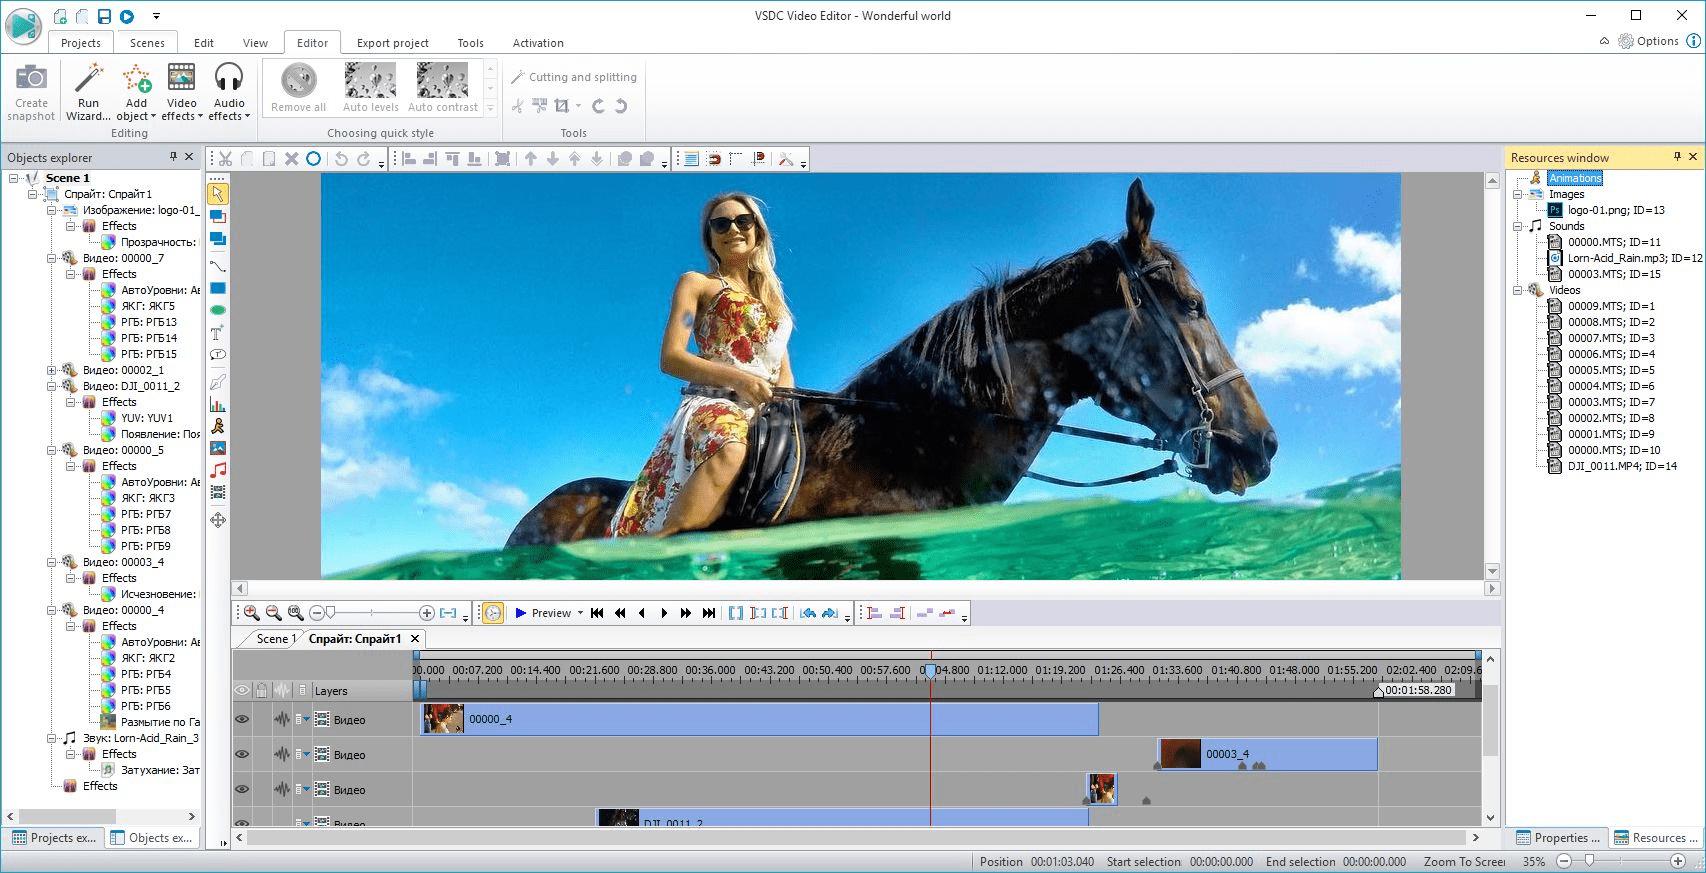 VSDC Video Editor Pro 6.6.7.276 Crack + Activation Key Latest 2021